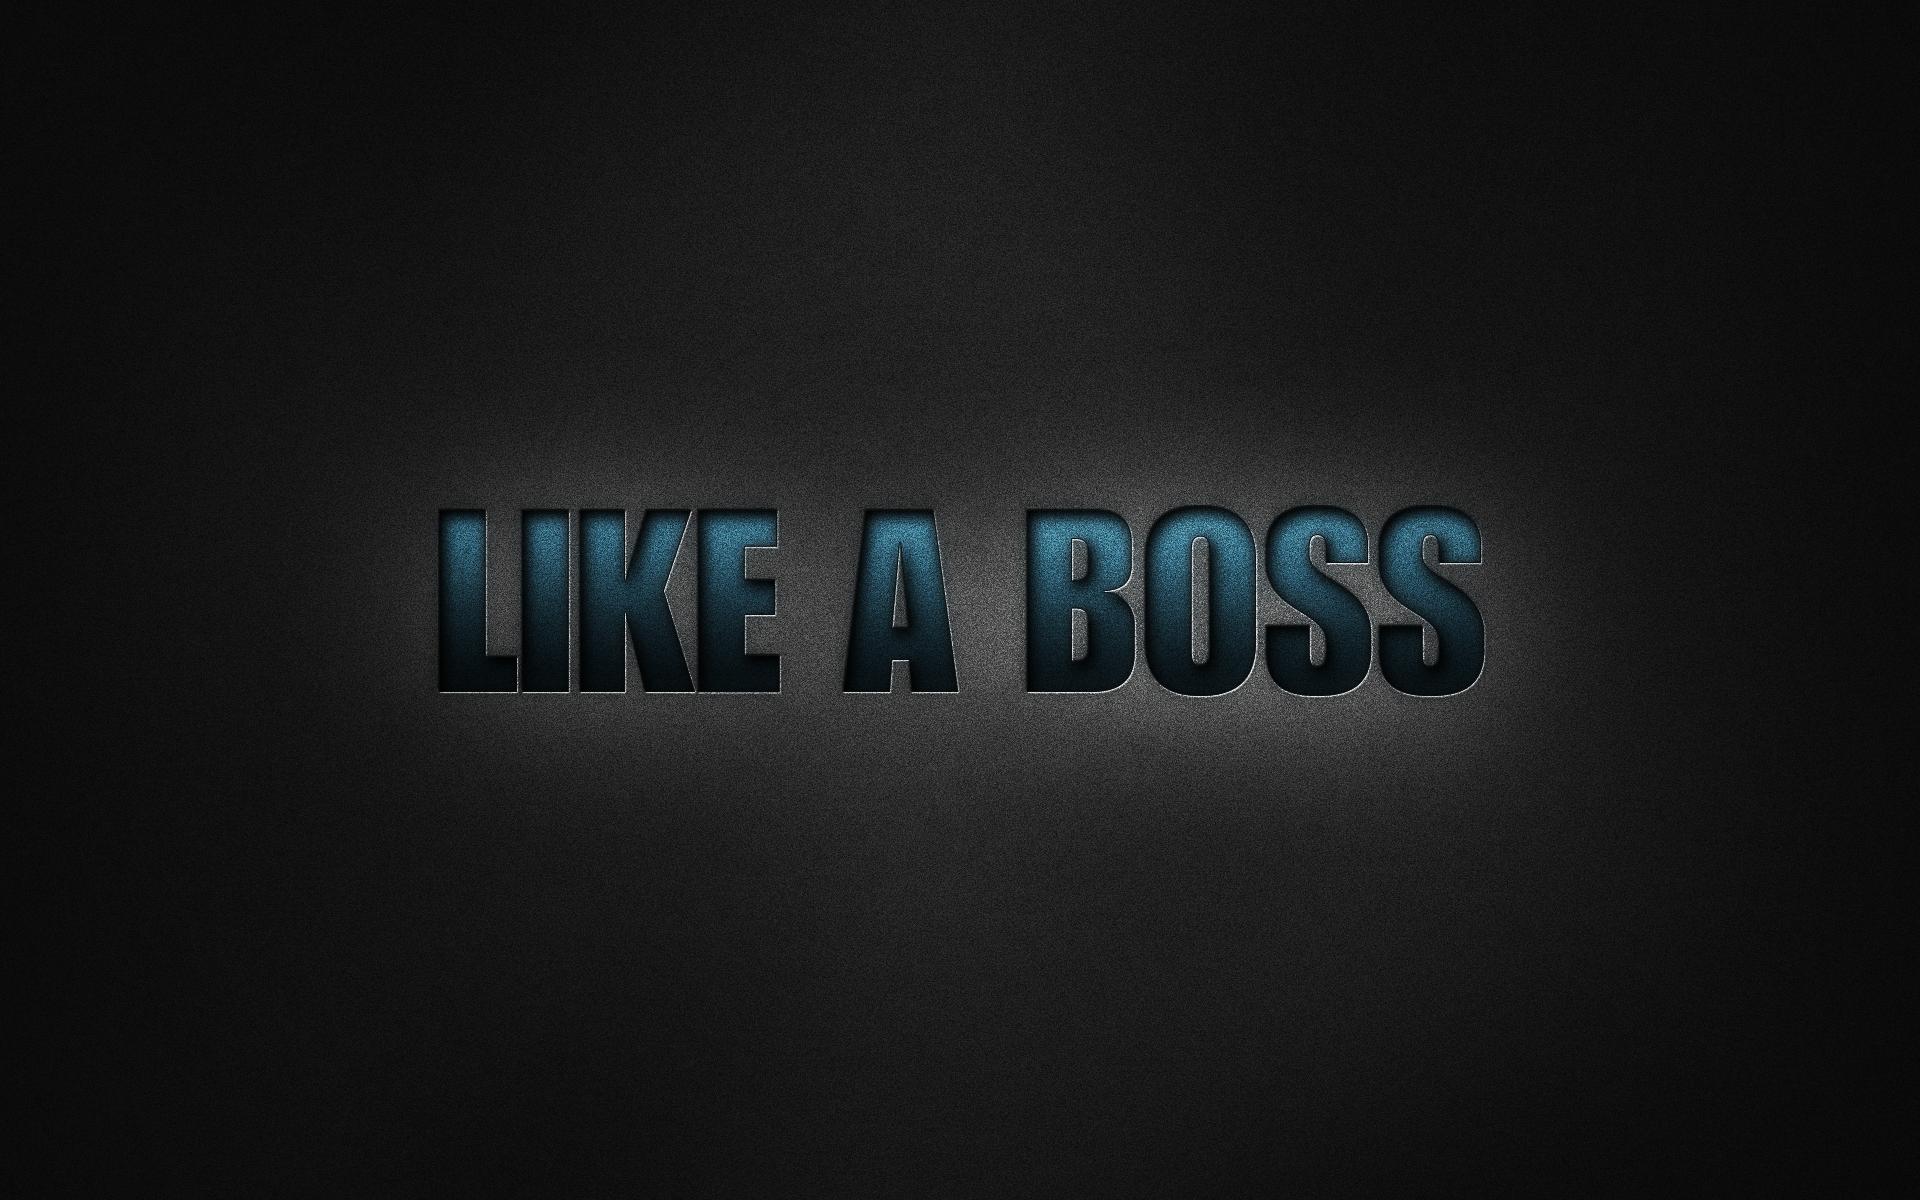 Work Like A Boss Wallpaper Wallpapersafari HD Wallpapers Download Free Images Wallpaper [1000image.com]